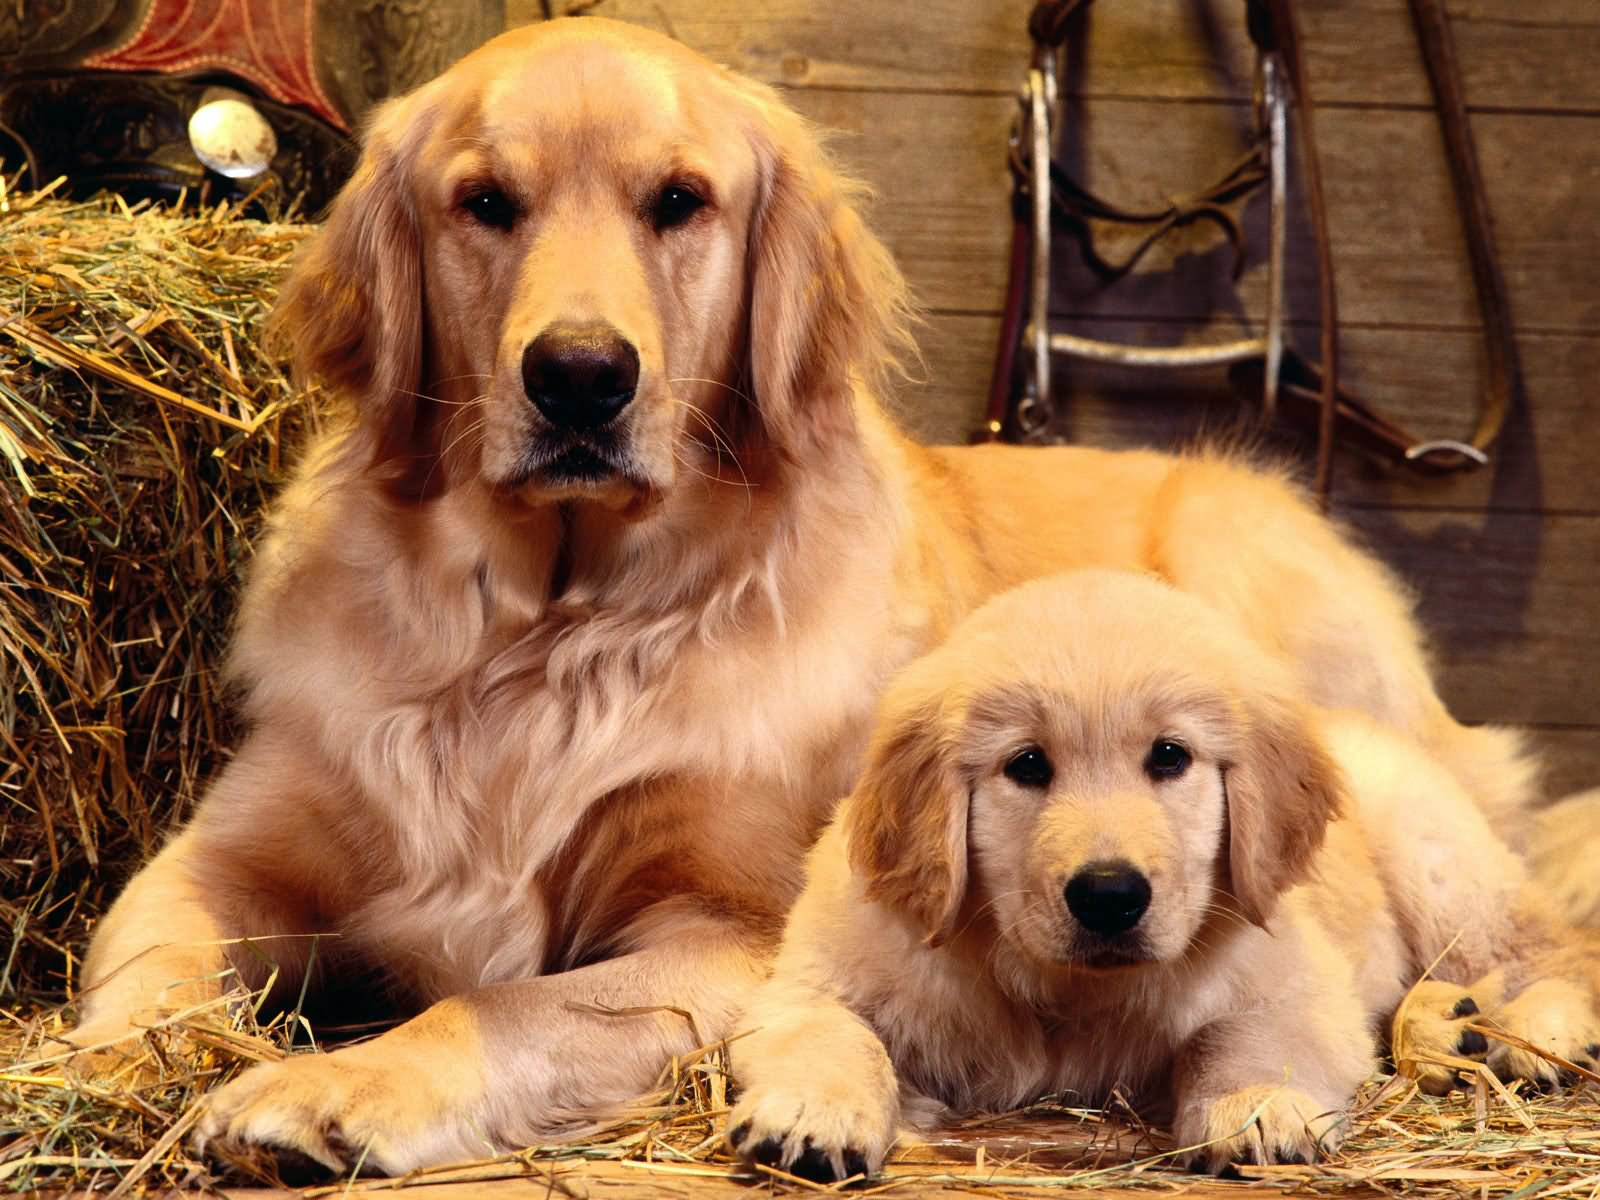 Buy Golden Retriever Puppies For Sale In Tasmania Australia